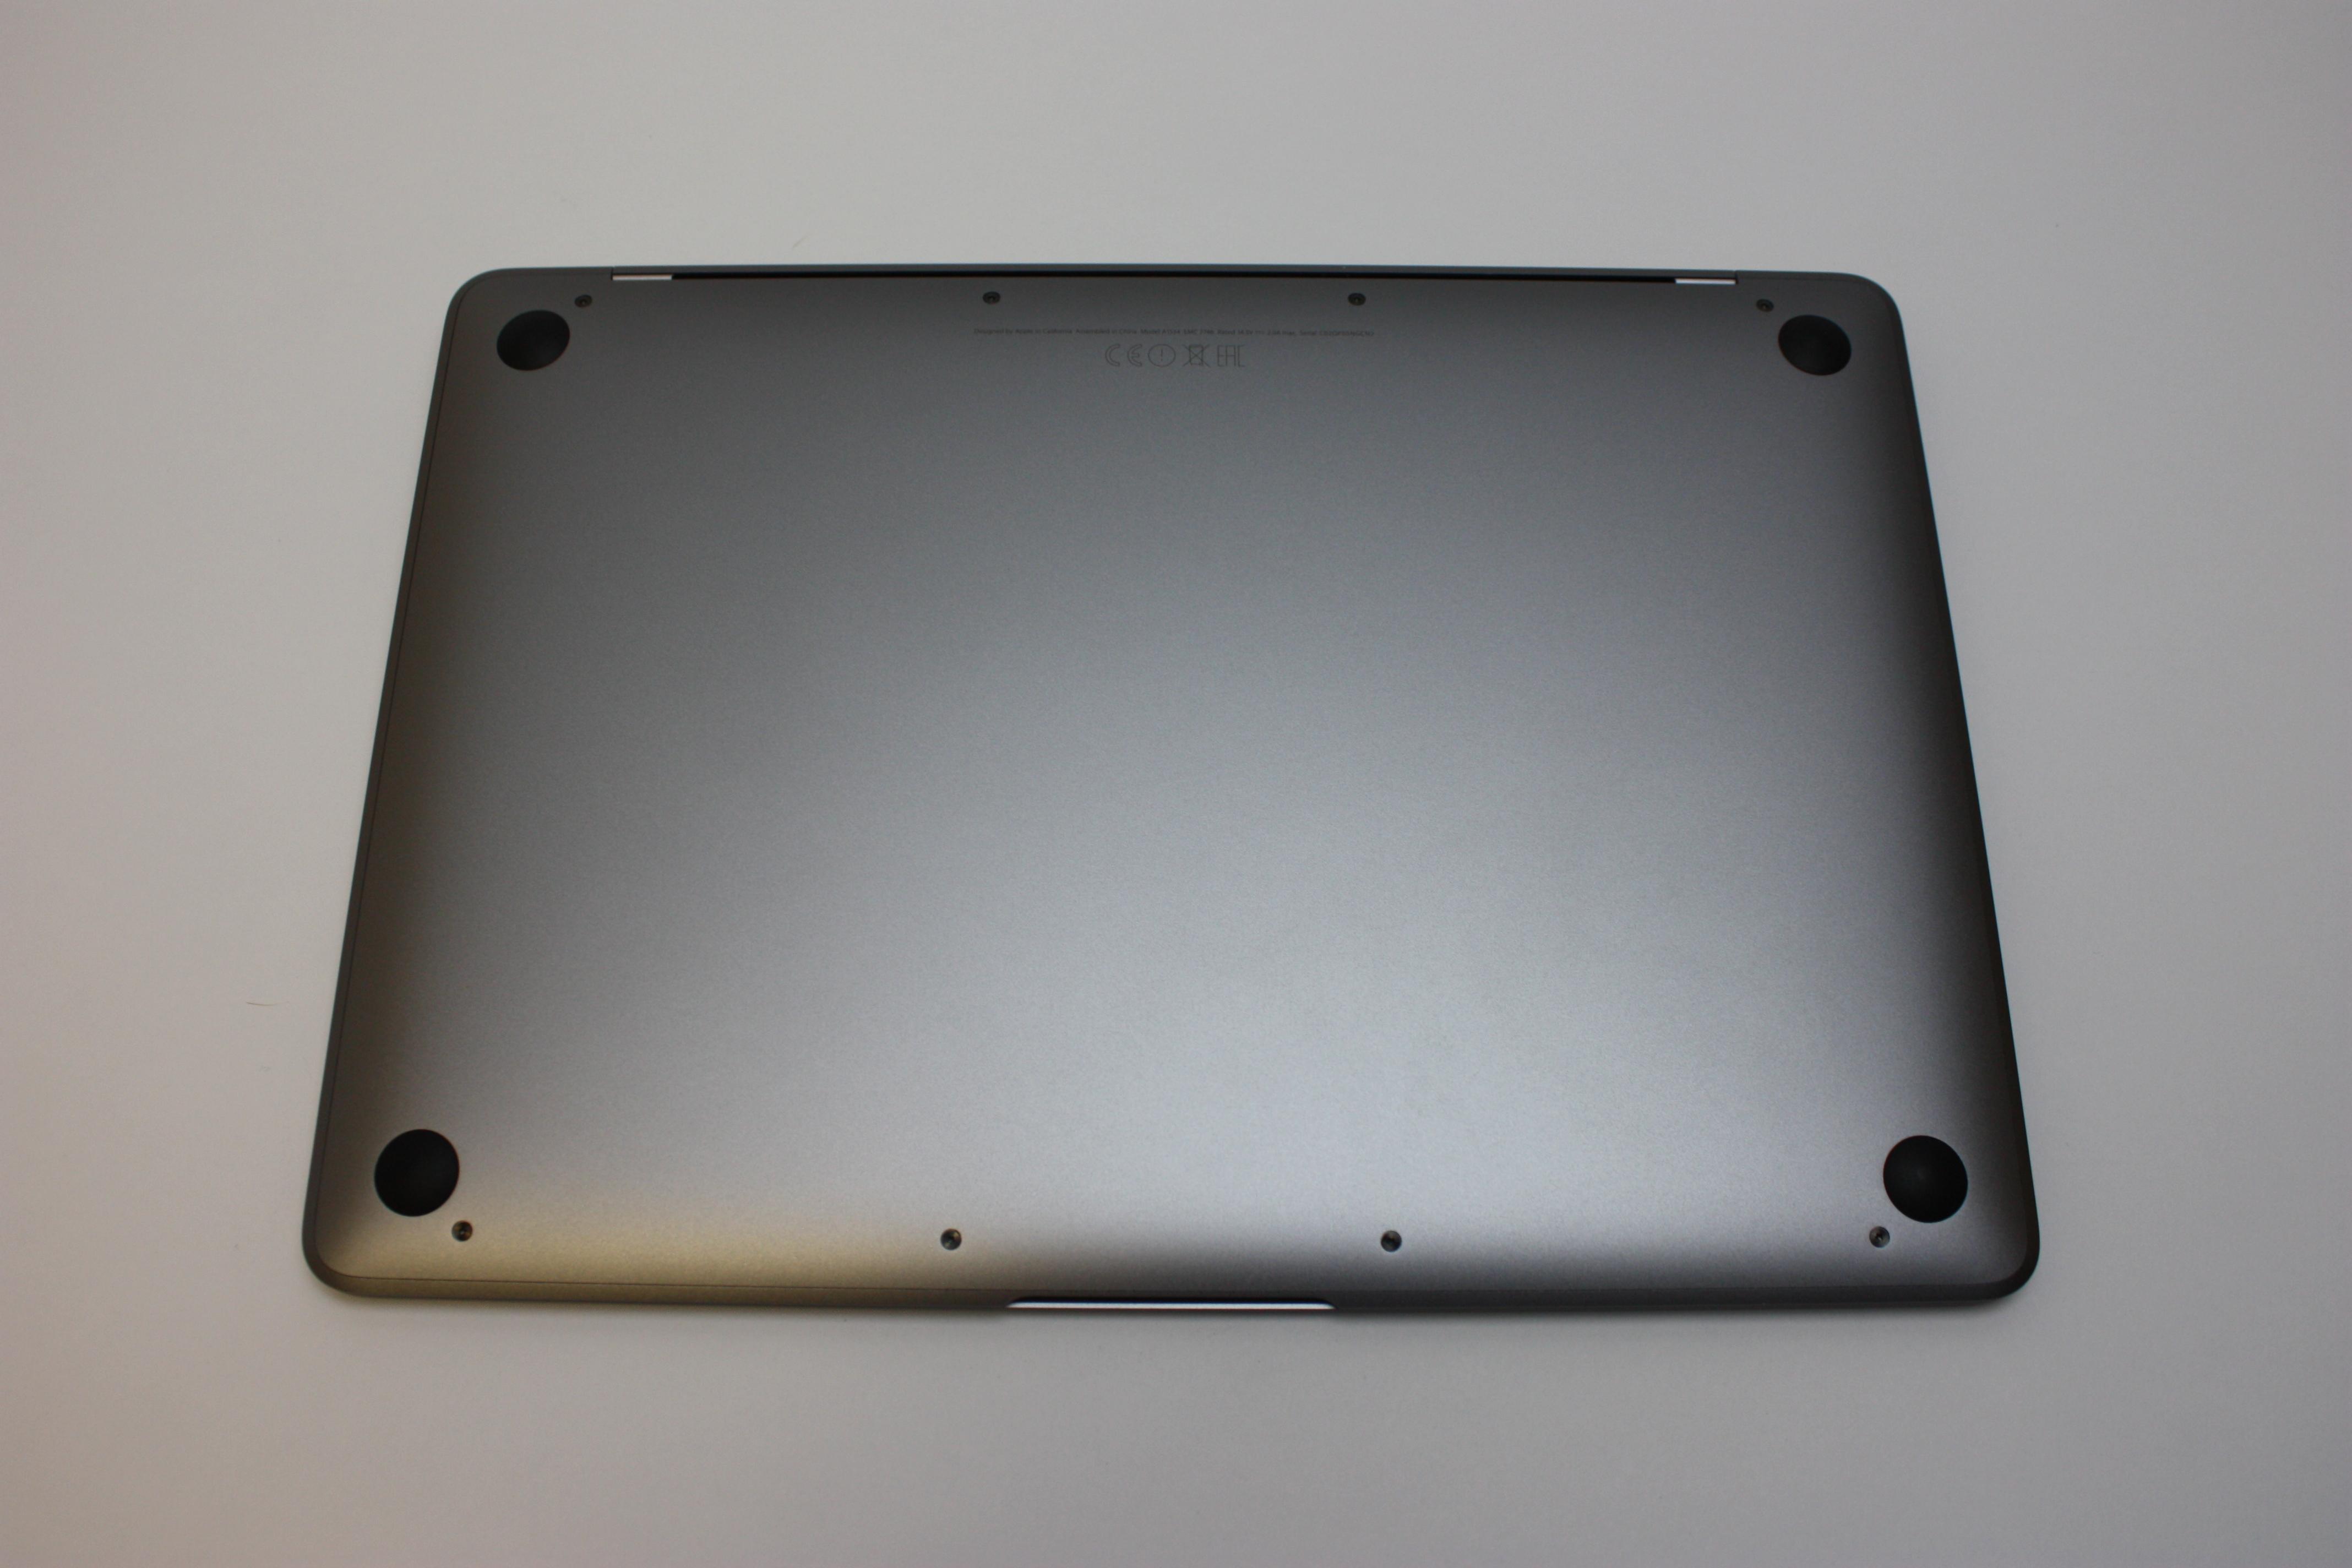 MacBook 12-inch Retina, 1.3 GHz Intel Core M, 8 GB 1600 MHz DDR3, 500 GB Flash Storage, Product age: 29 months, image 8